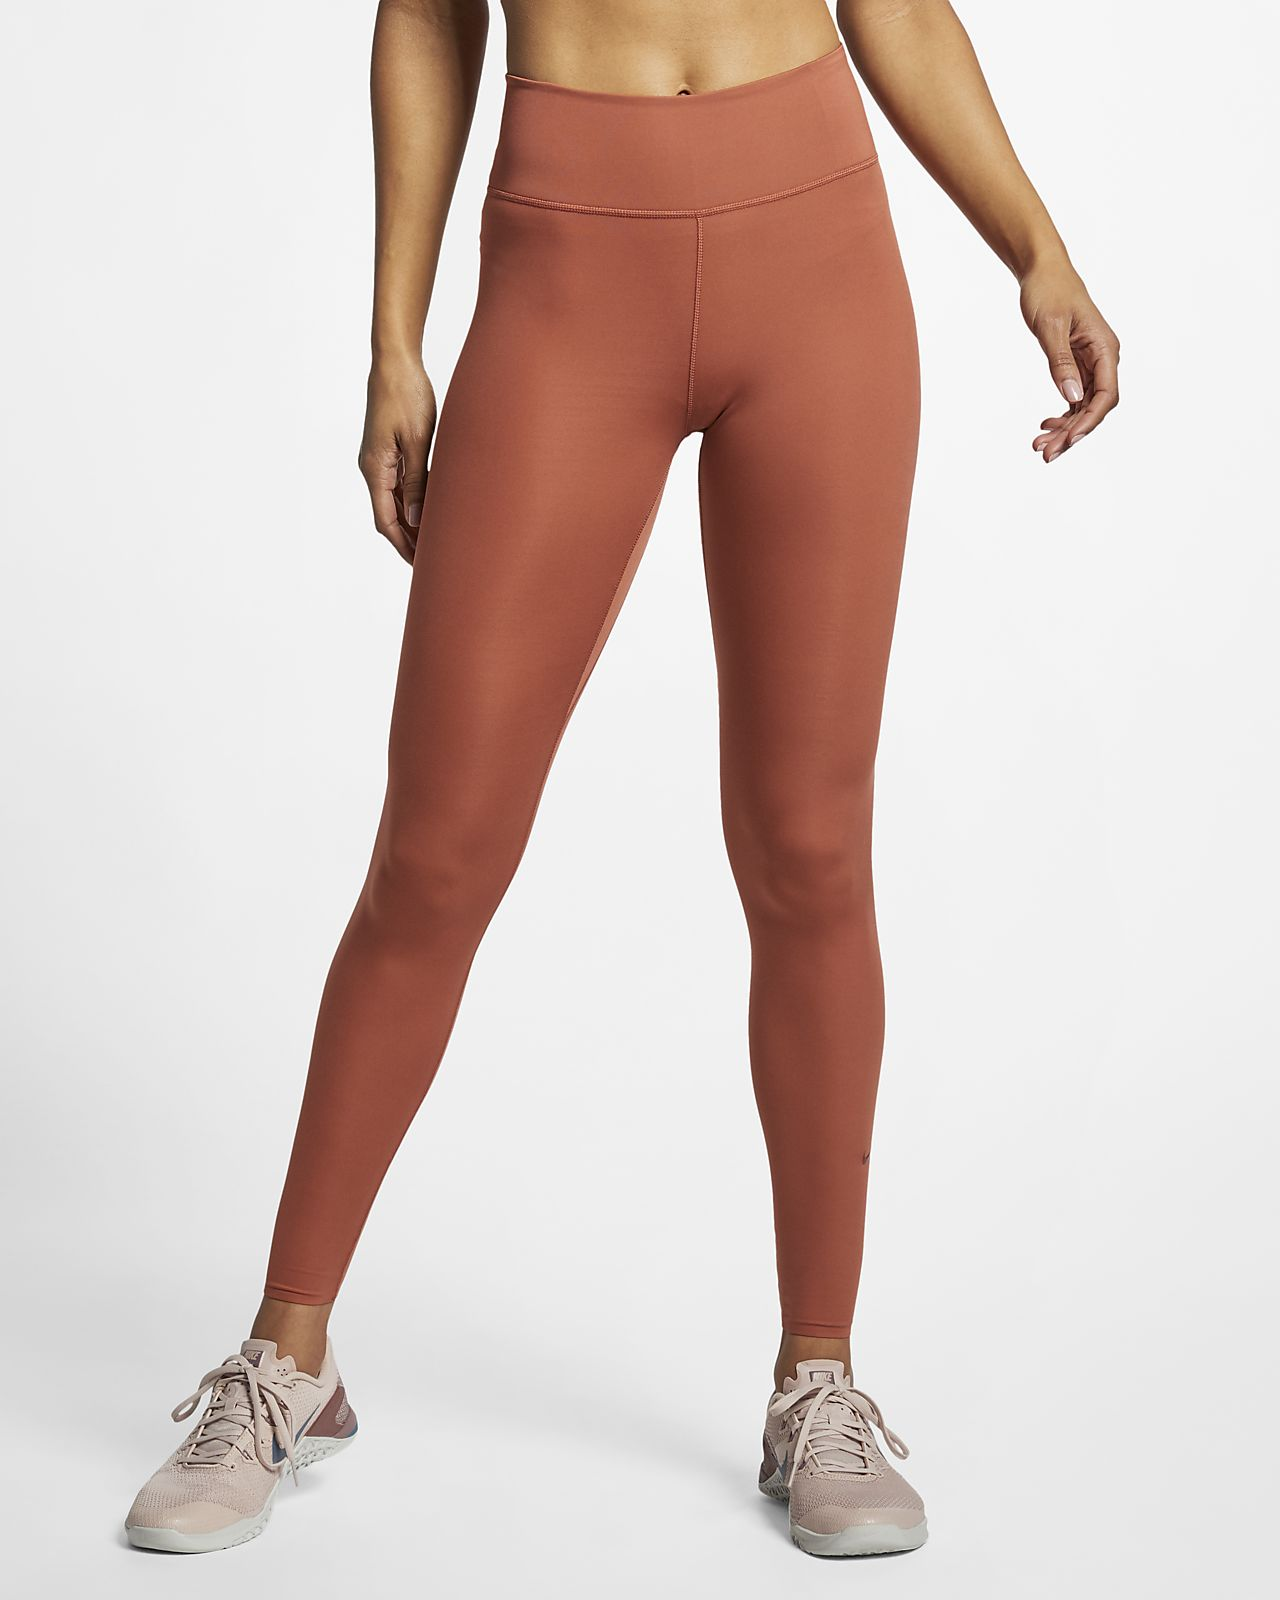 Nike One Luxe testhezálló női nadrág